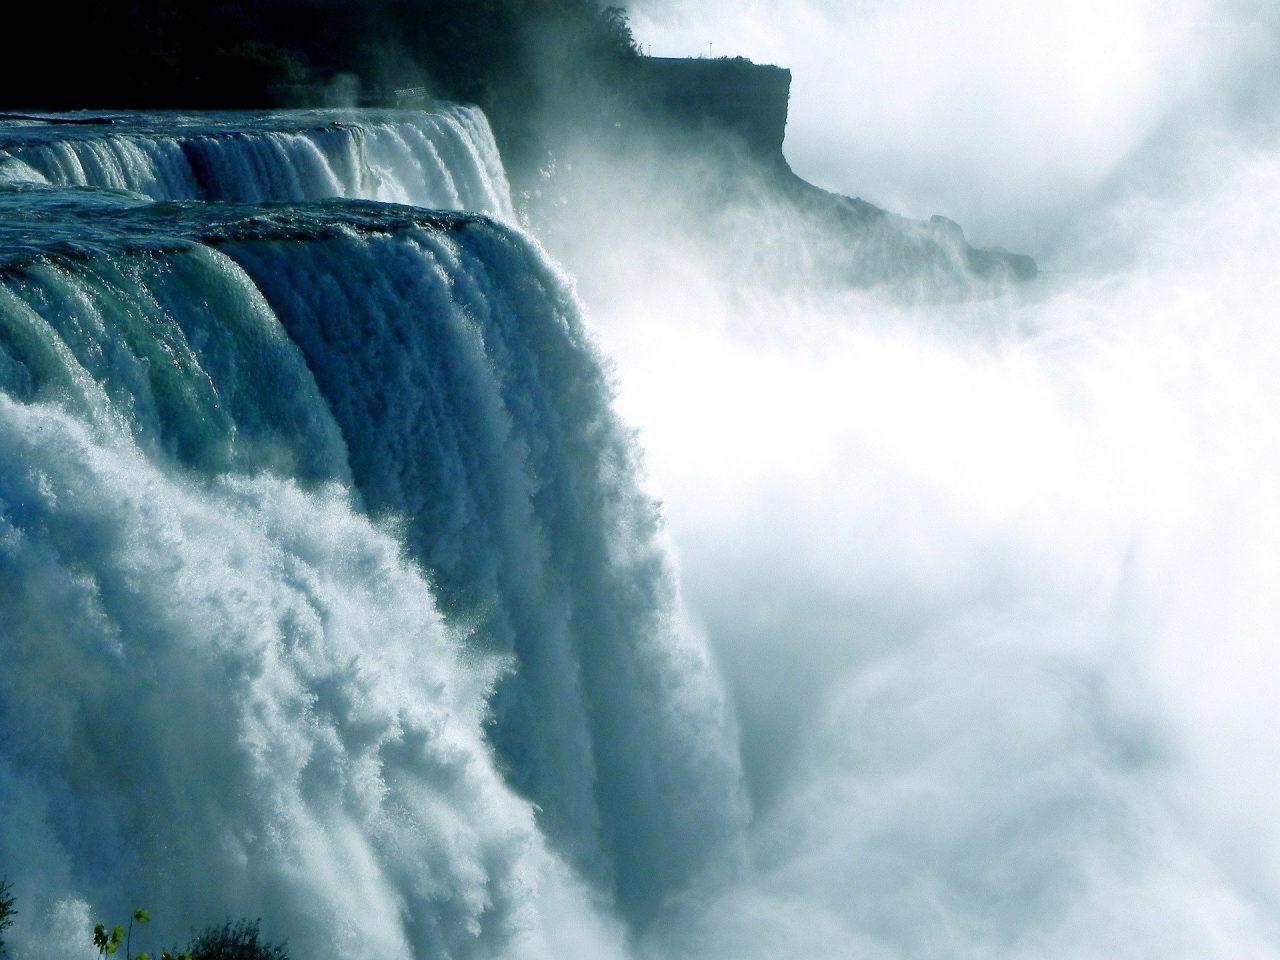 Afbeelding niagara-falls van urformat via Pixabay